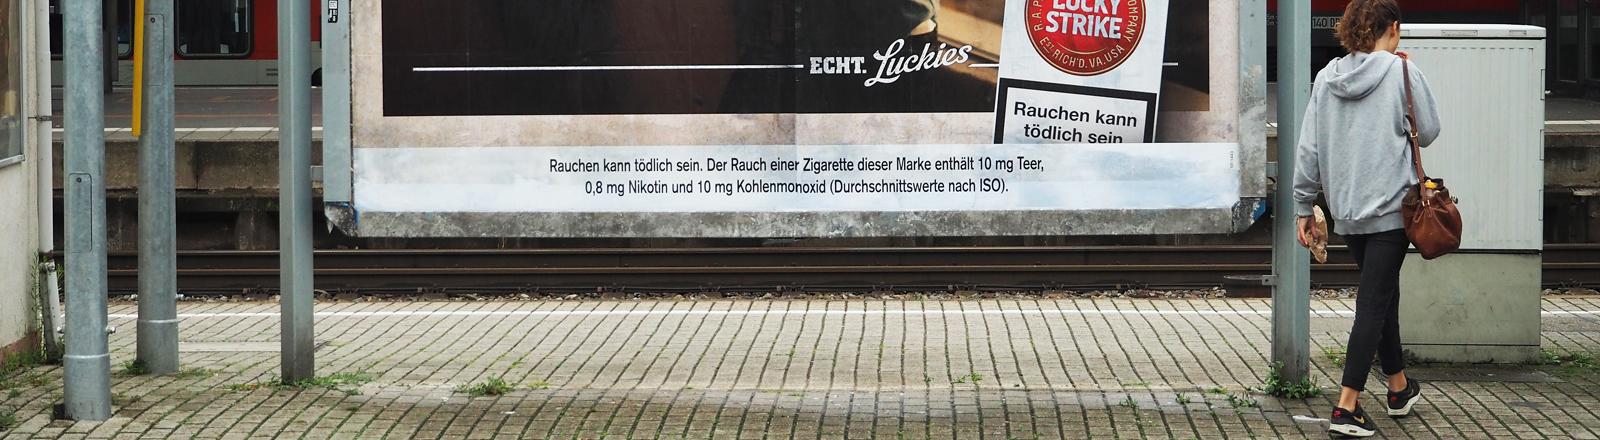 Tabakplakat am Bahnhof